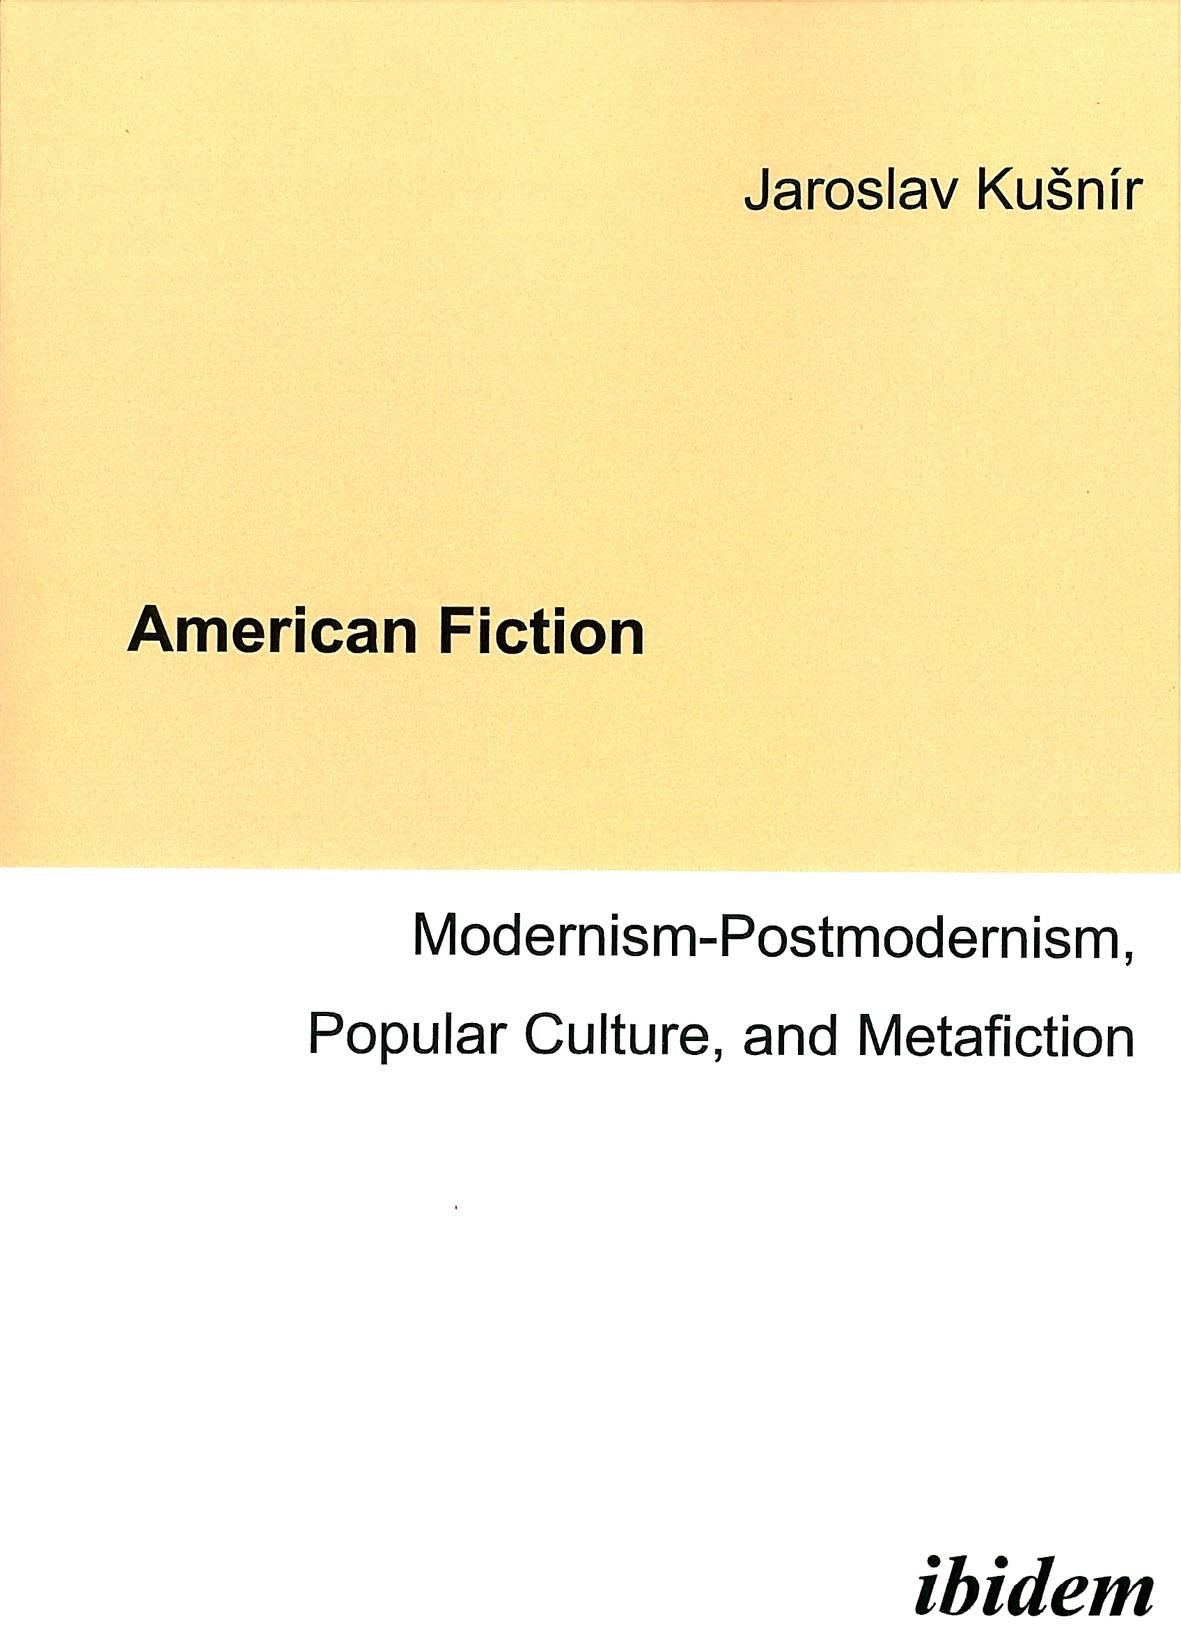 American Fiction: Modernism-Postmodernism, Popular Culture, and Metafiction